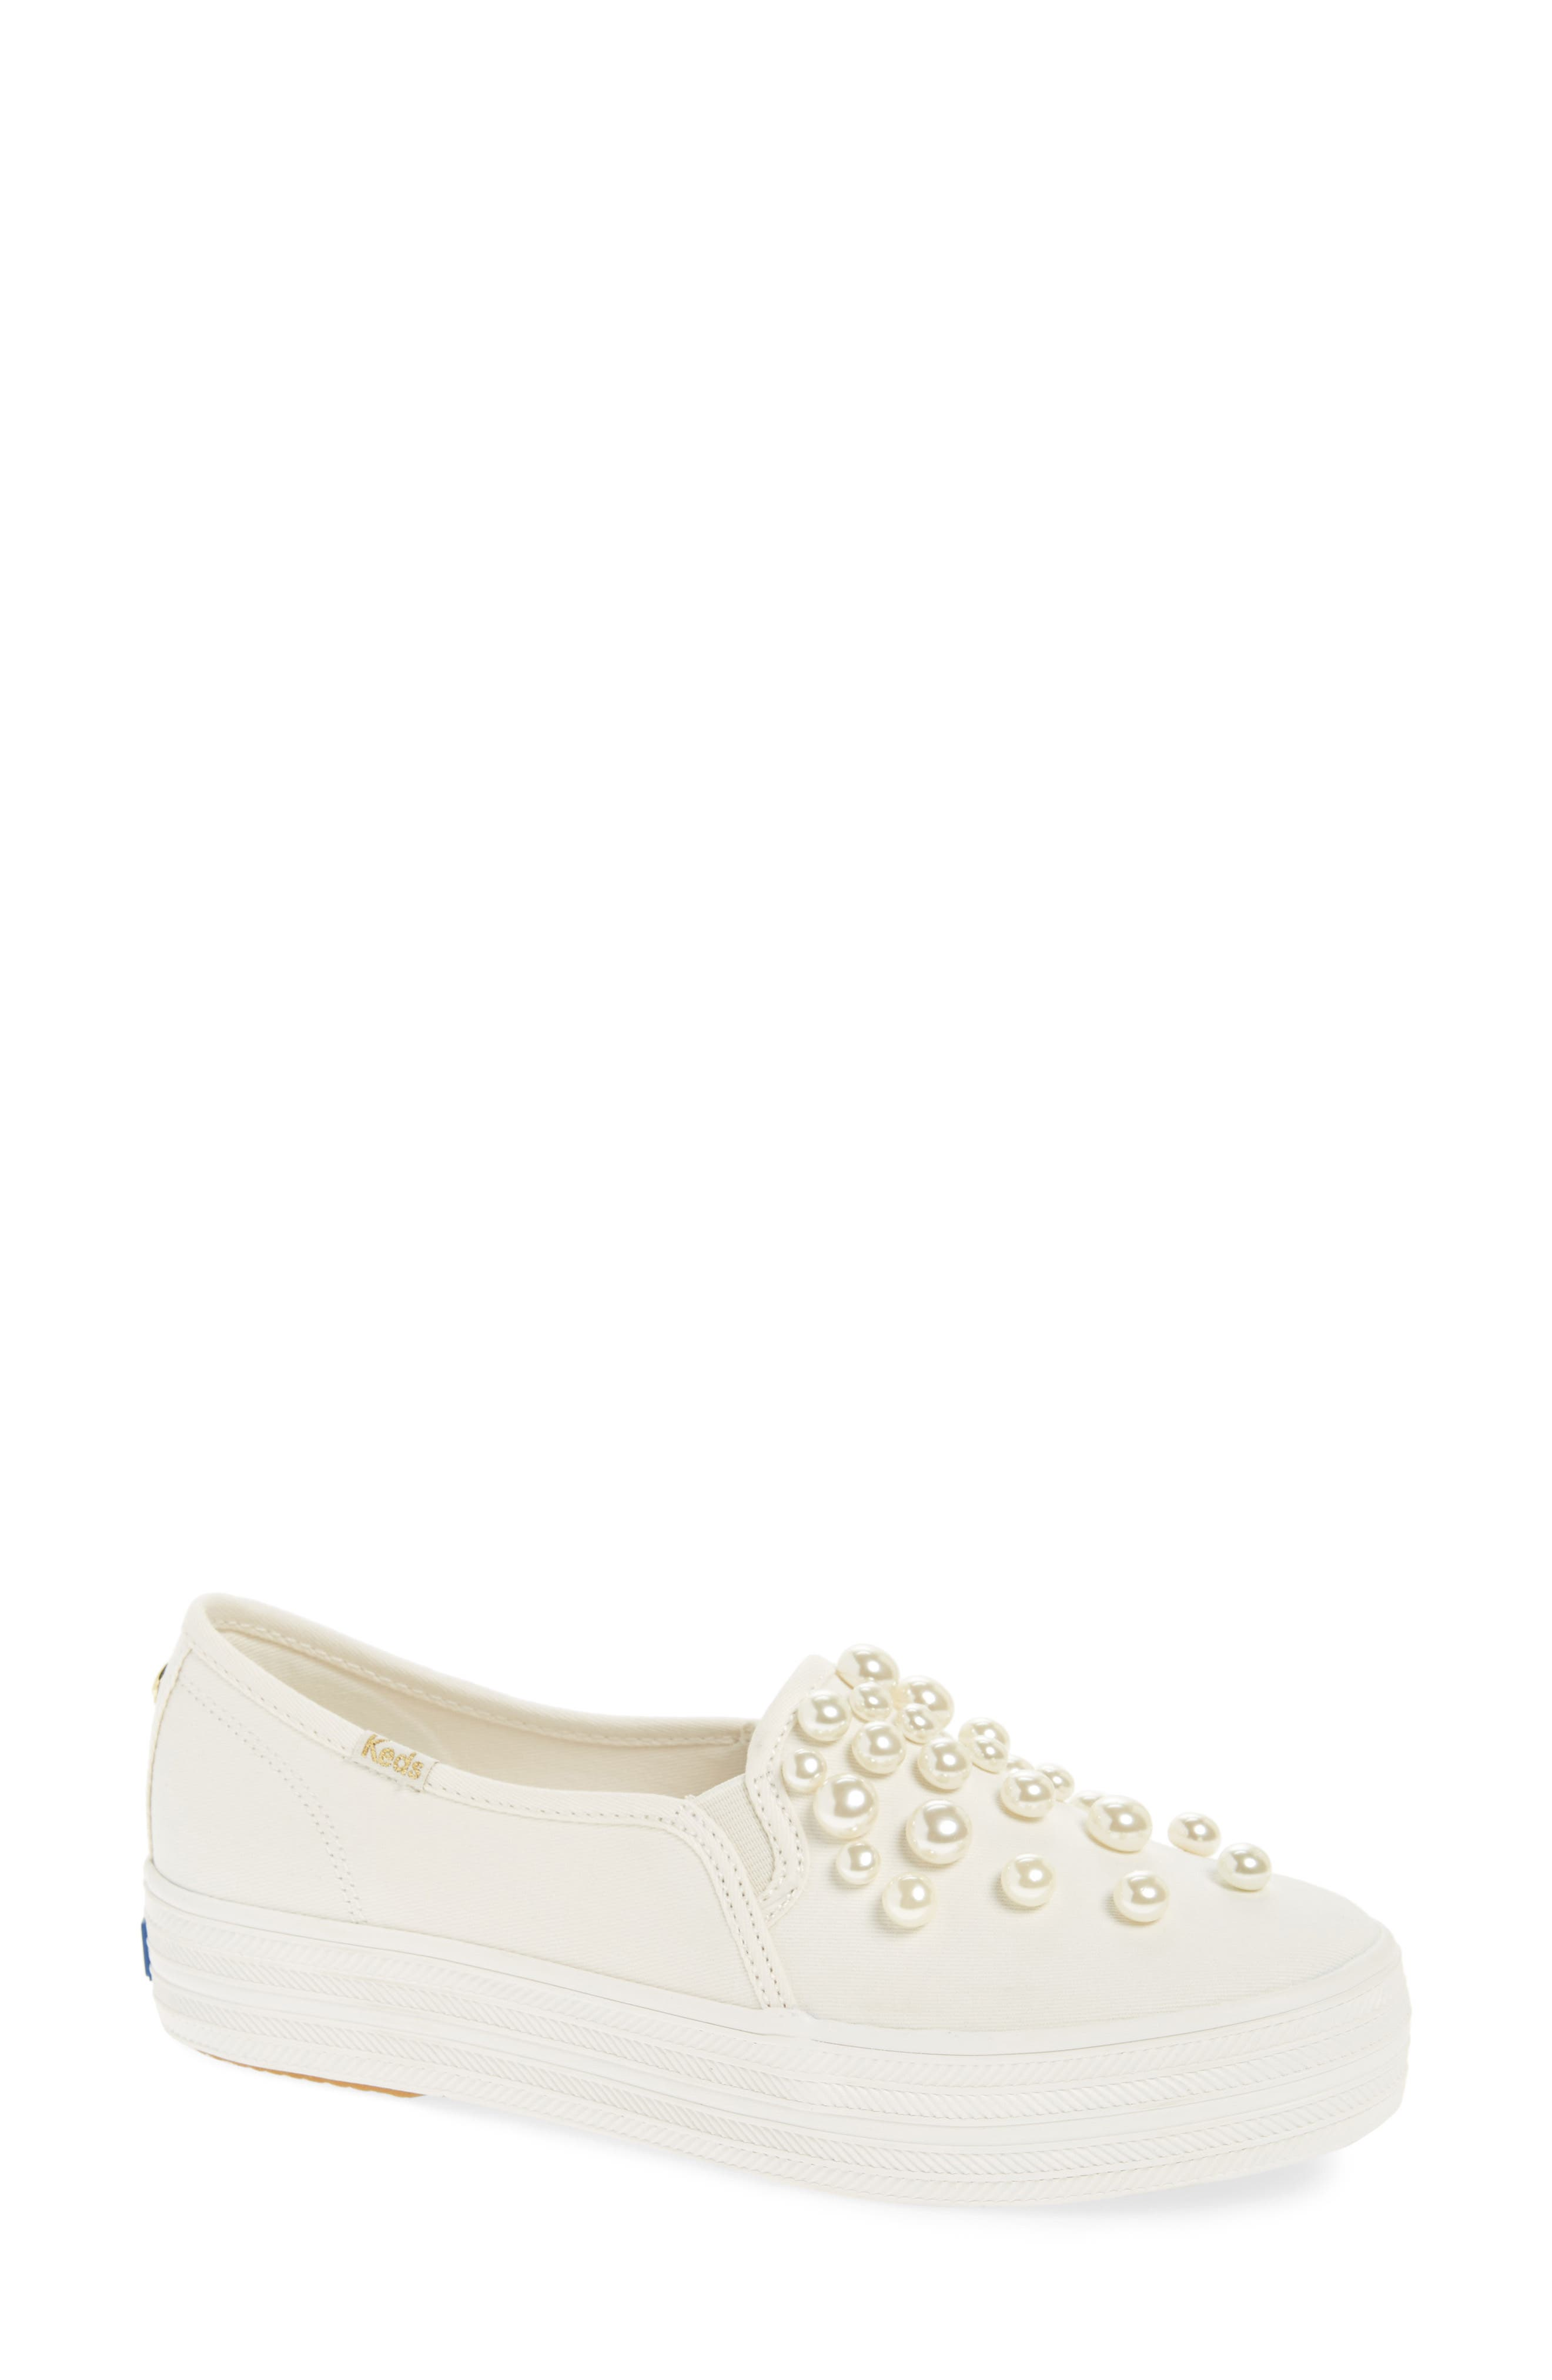 triple decker embellished slip-on sneaker,                             Main thumbnail 1, color,                             CREAM